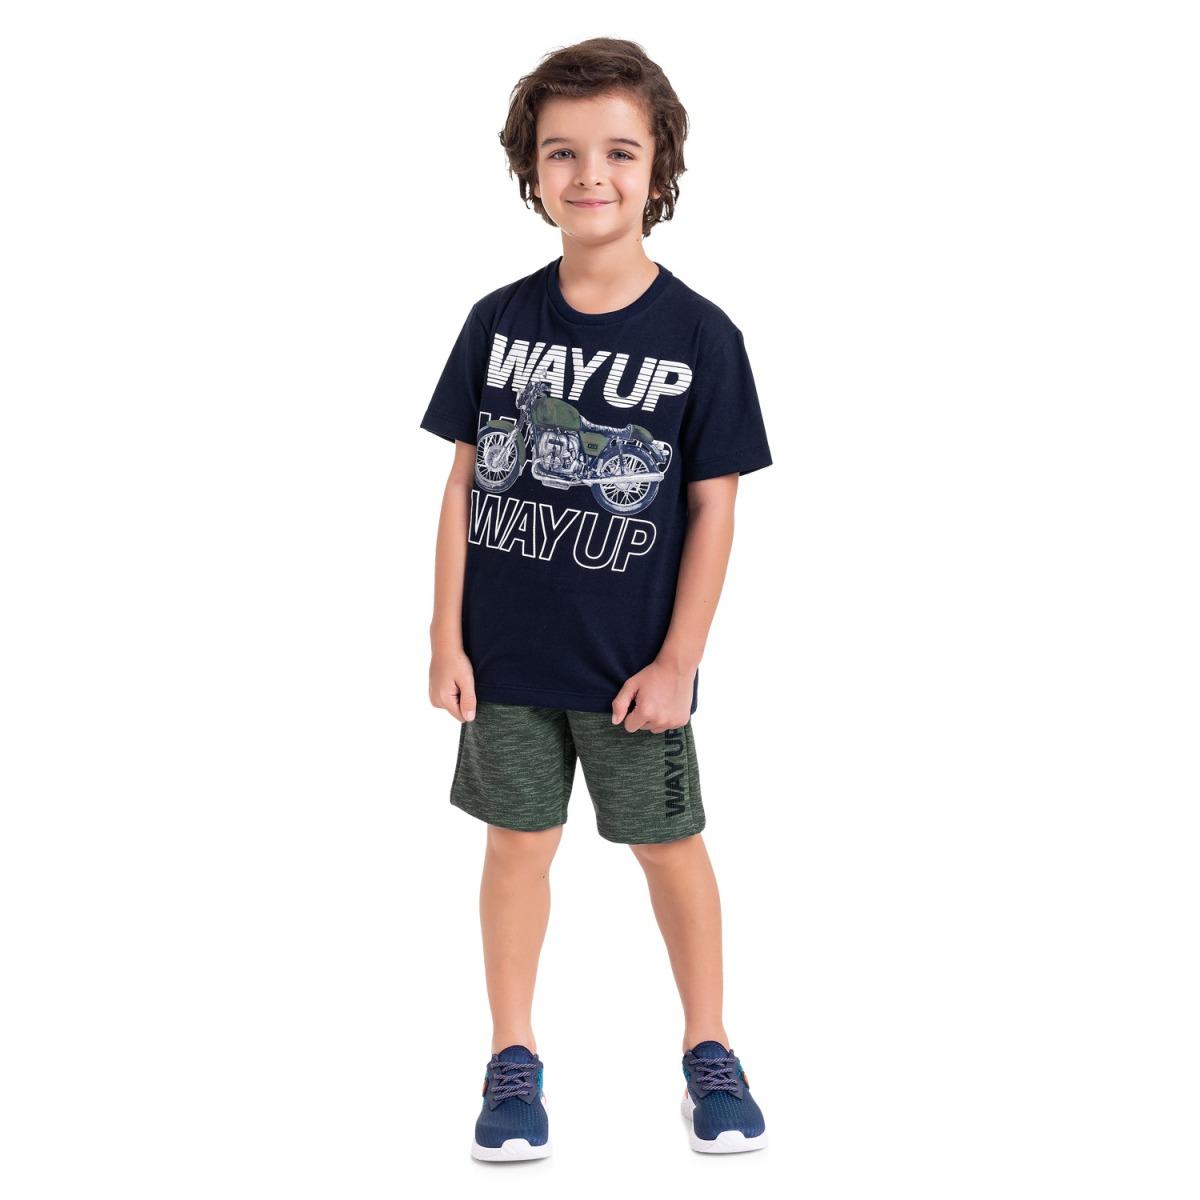 Conjunto Menino Milon Camiseta e Bermuda 3 cabos